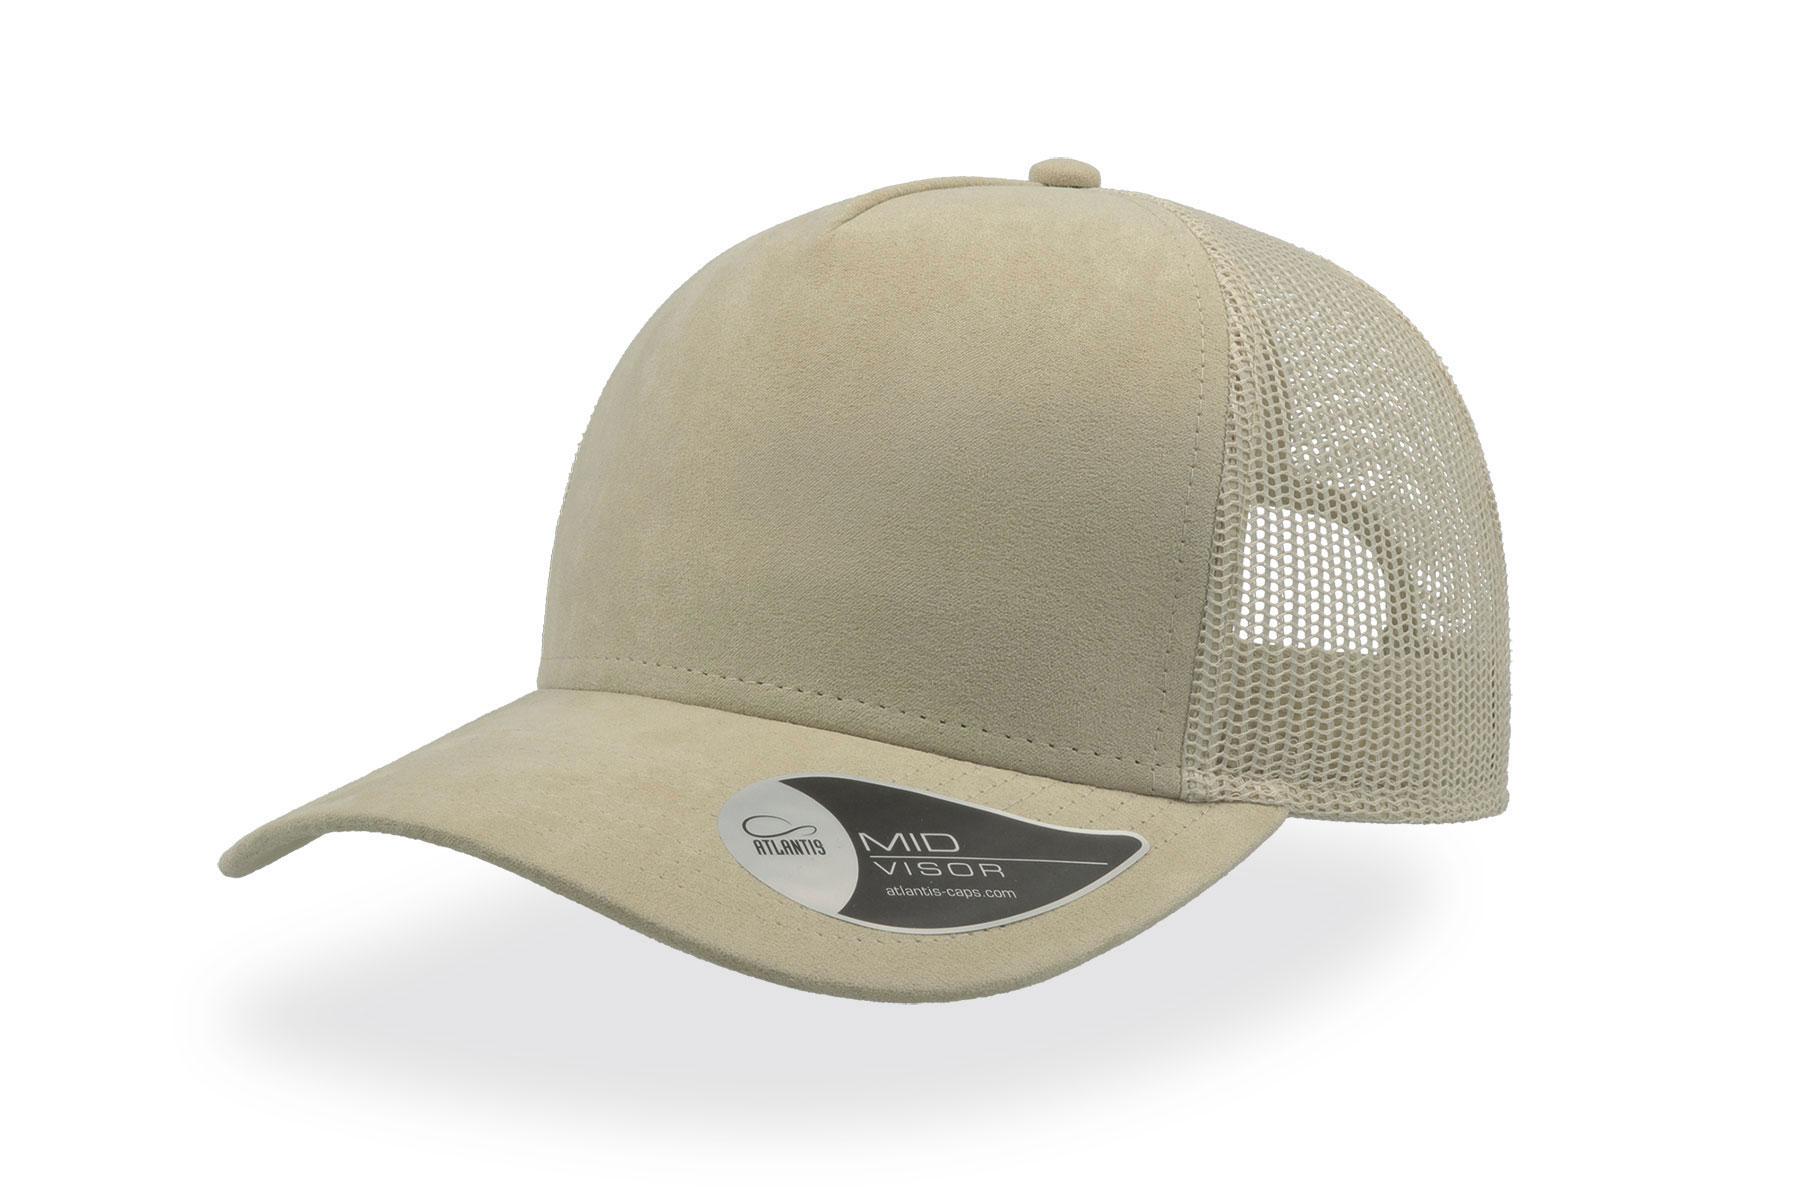 Rapper Suede Verkkolippis - NEW 2019 ATLANTIS CAPS & HATS - RASU - 2